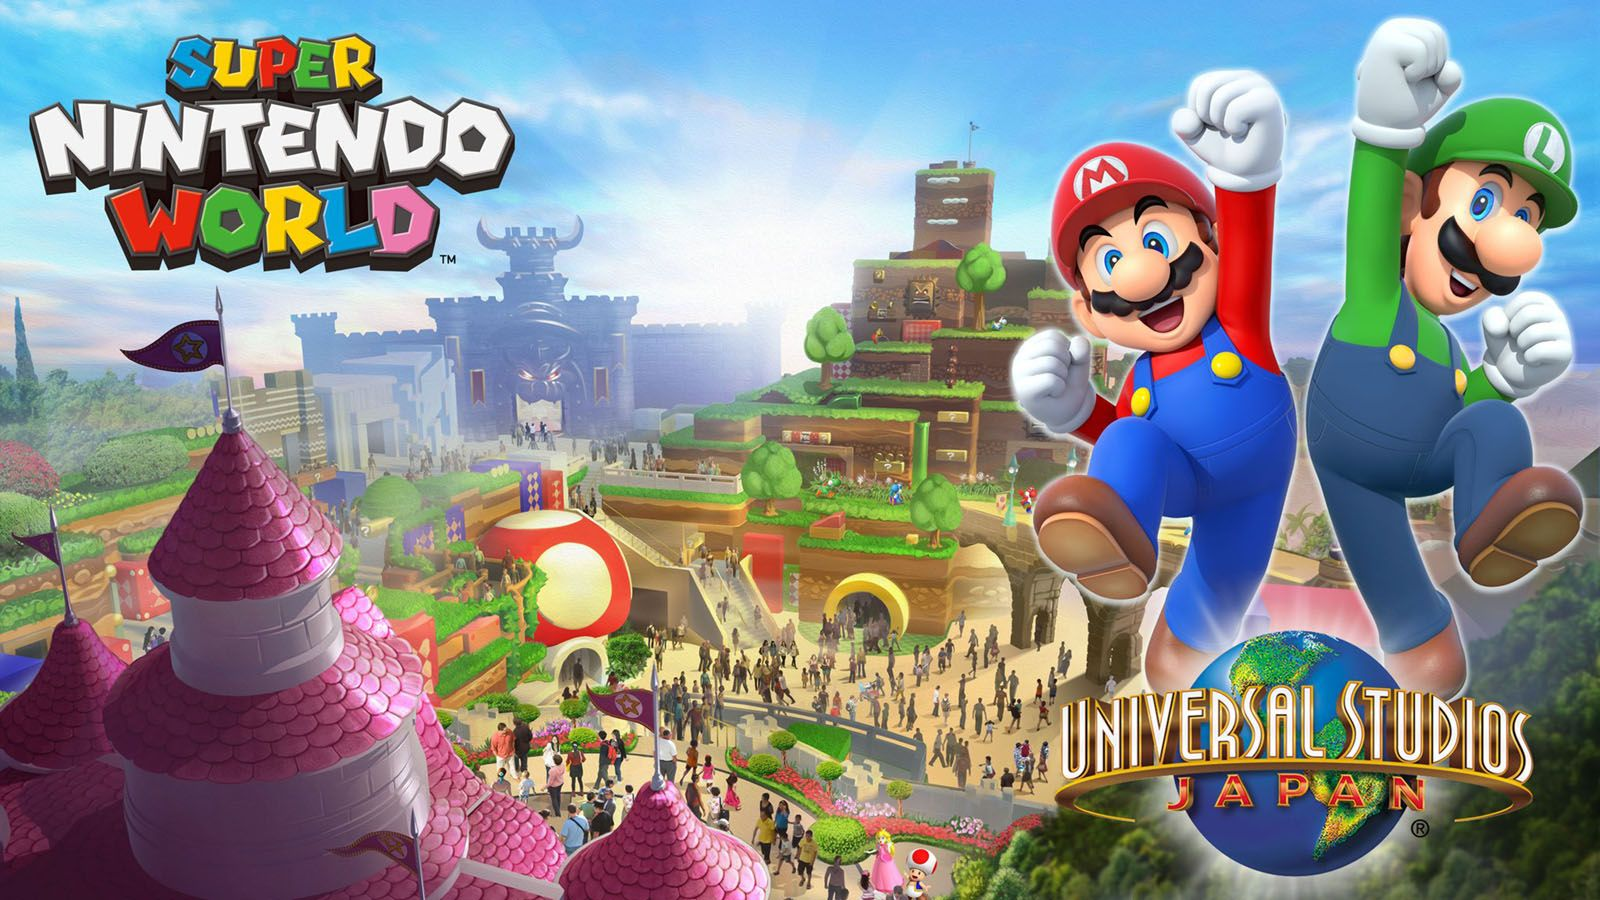 Super Nintendo World Coming To Universal Studios Nintendo World